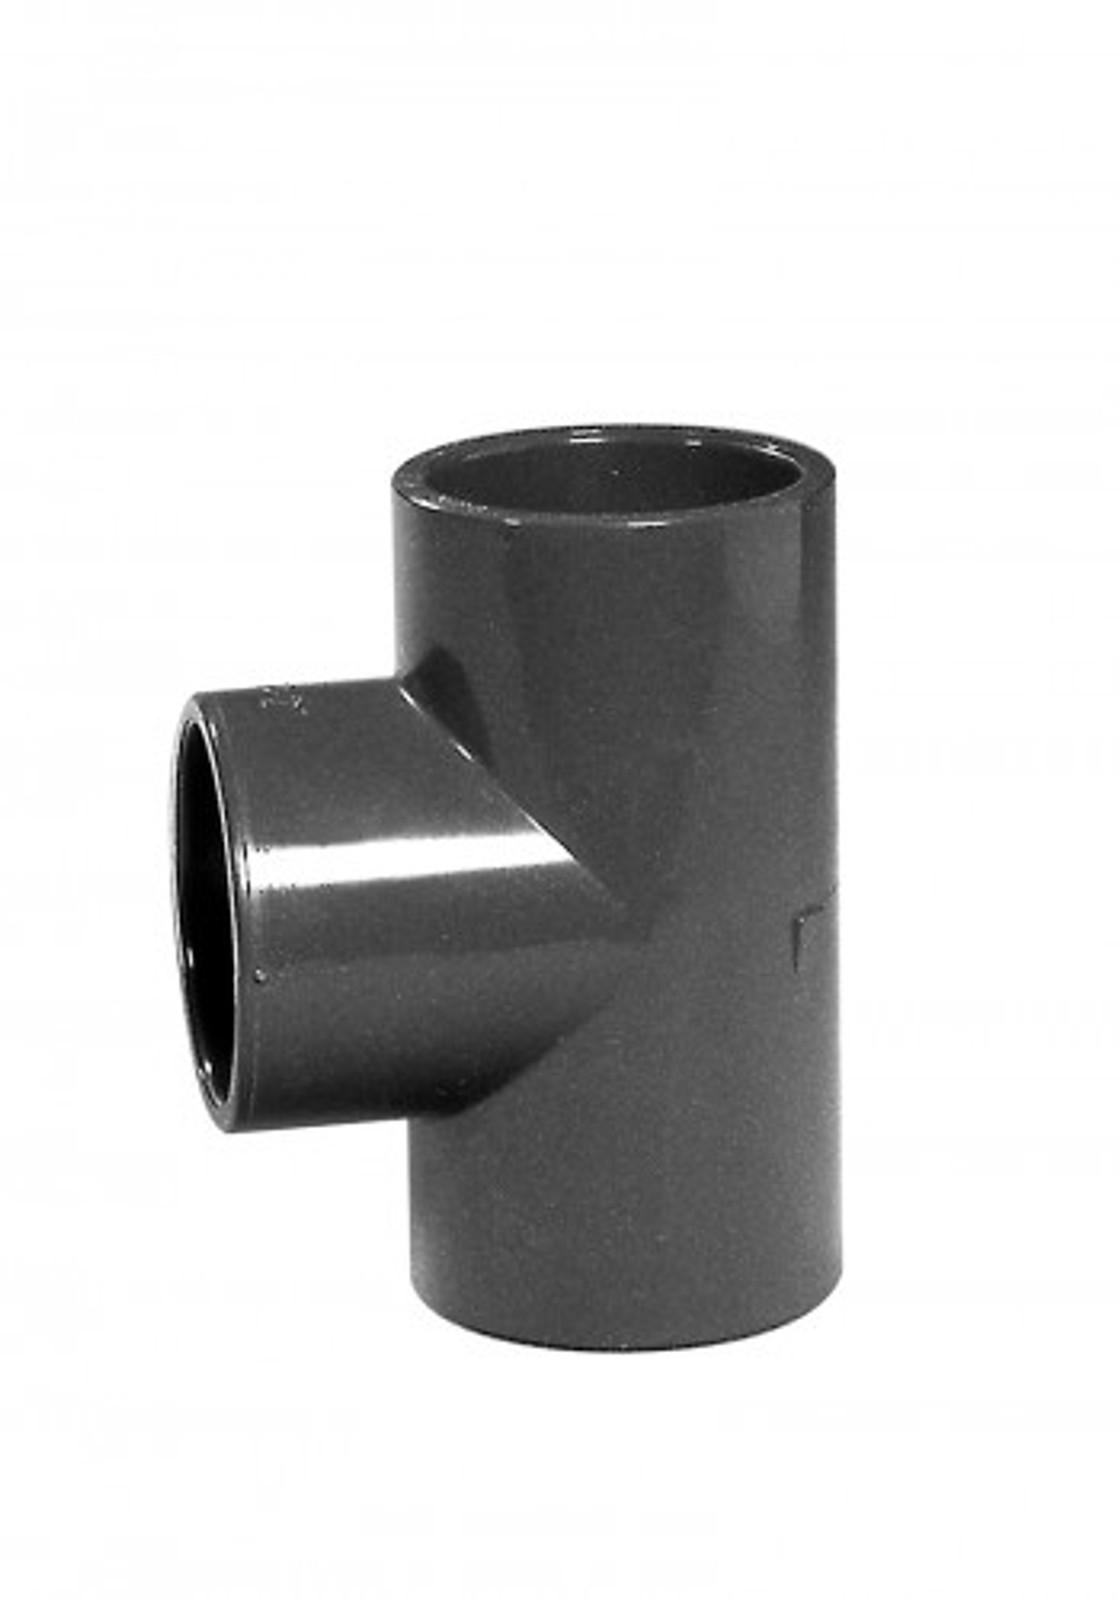 T-Stück 90°, 110 mm aus PVC